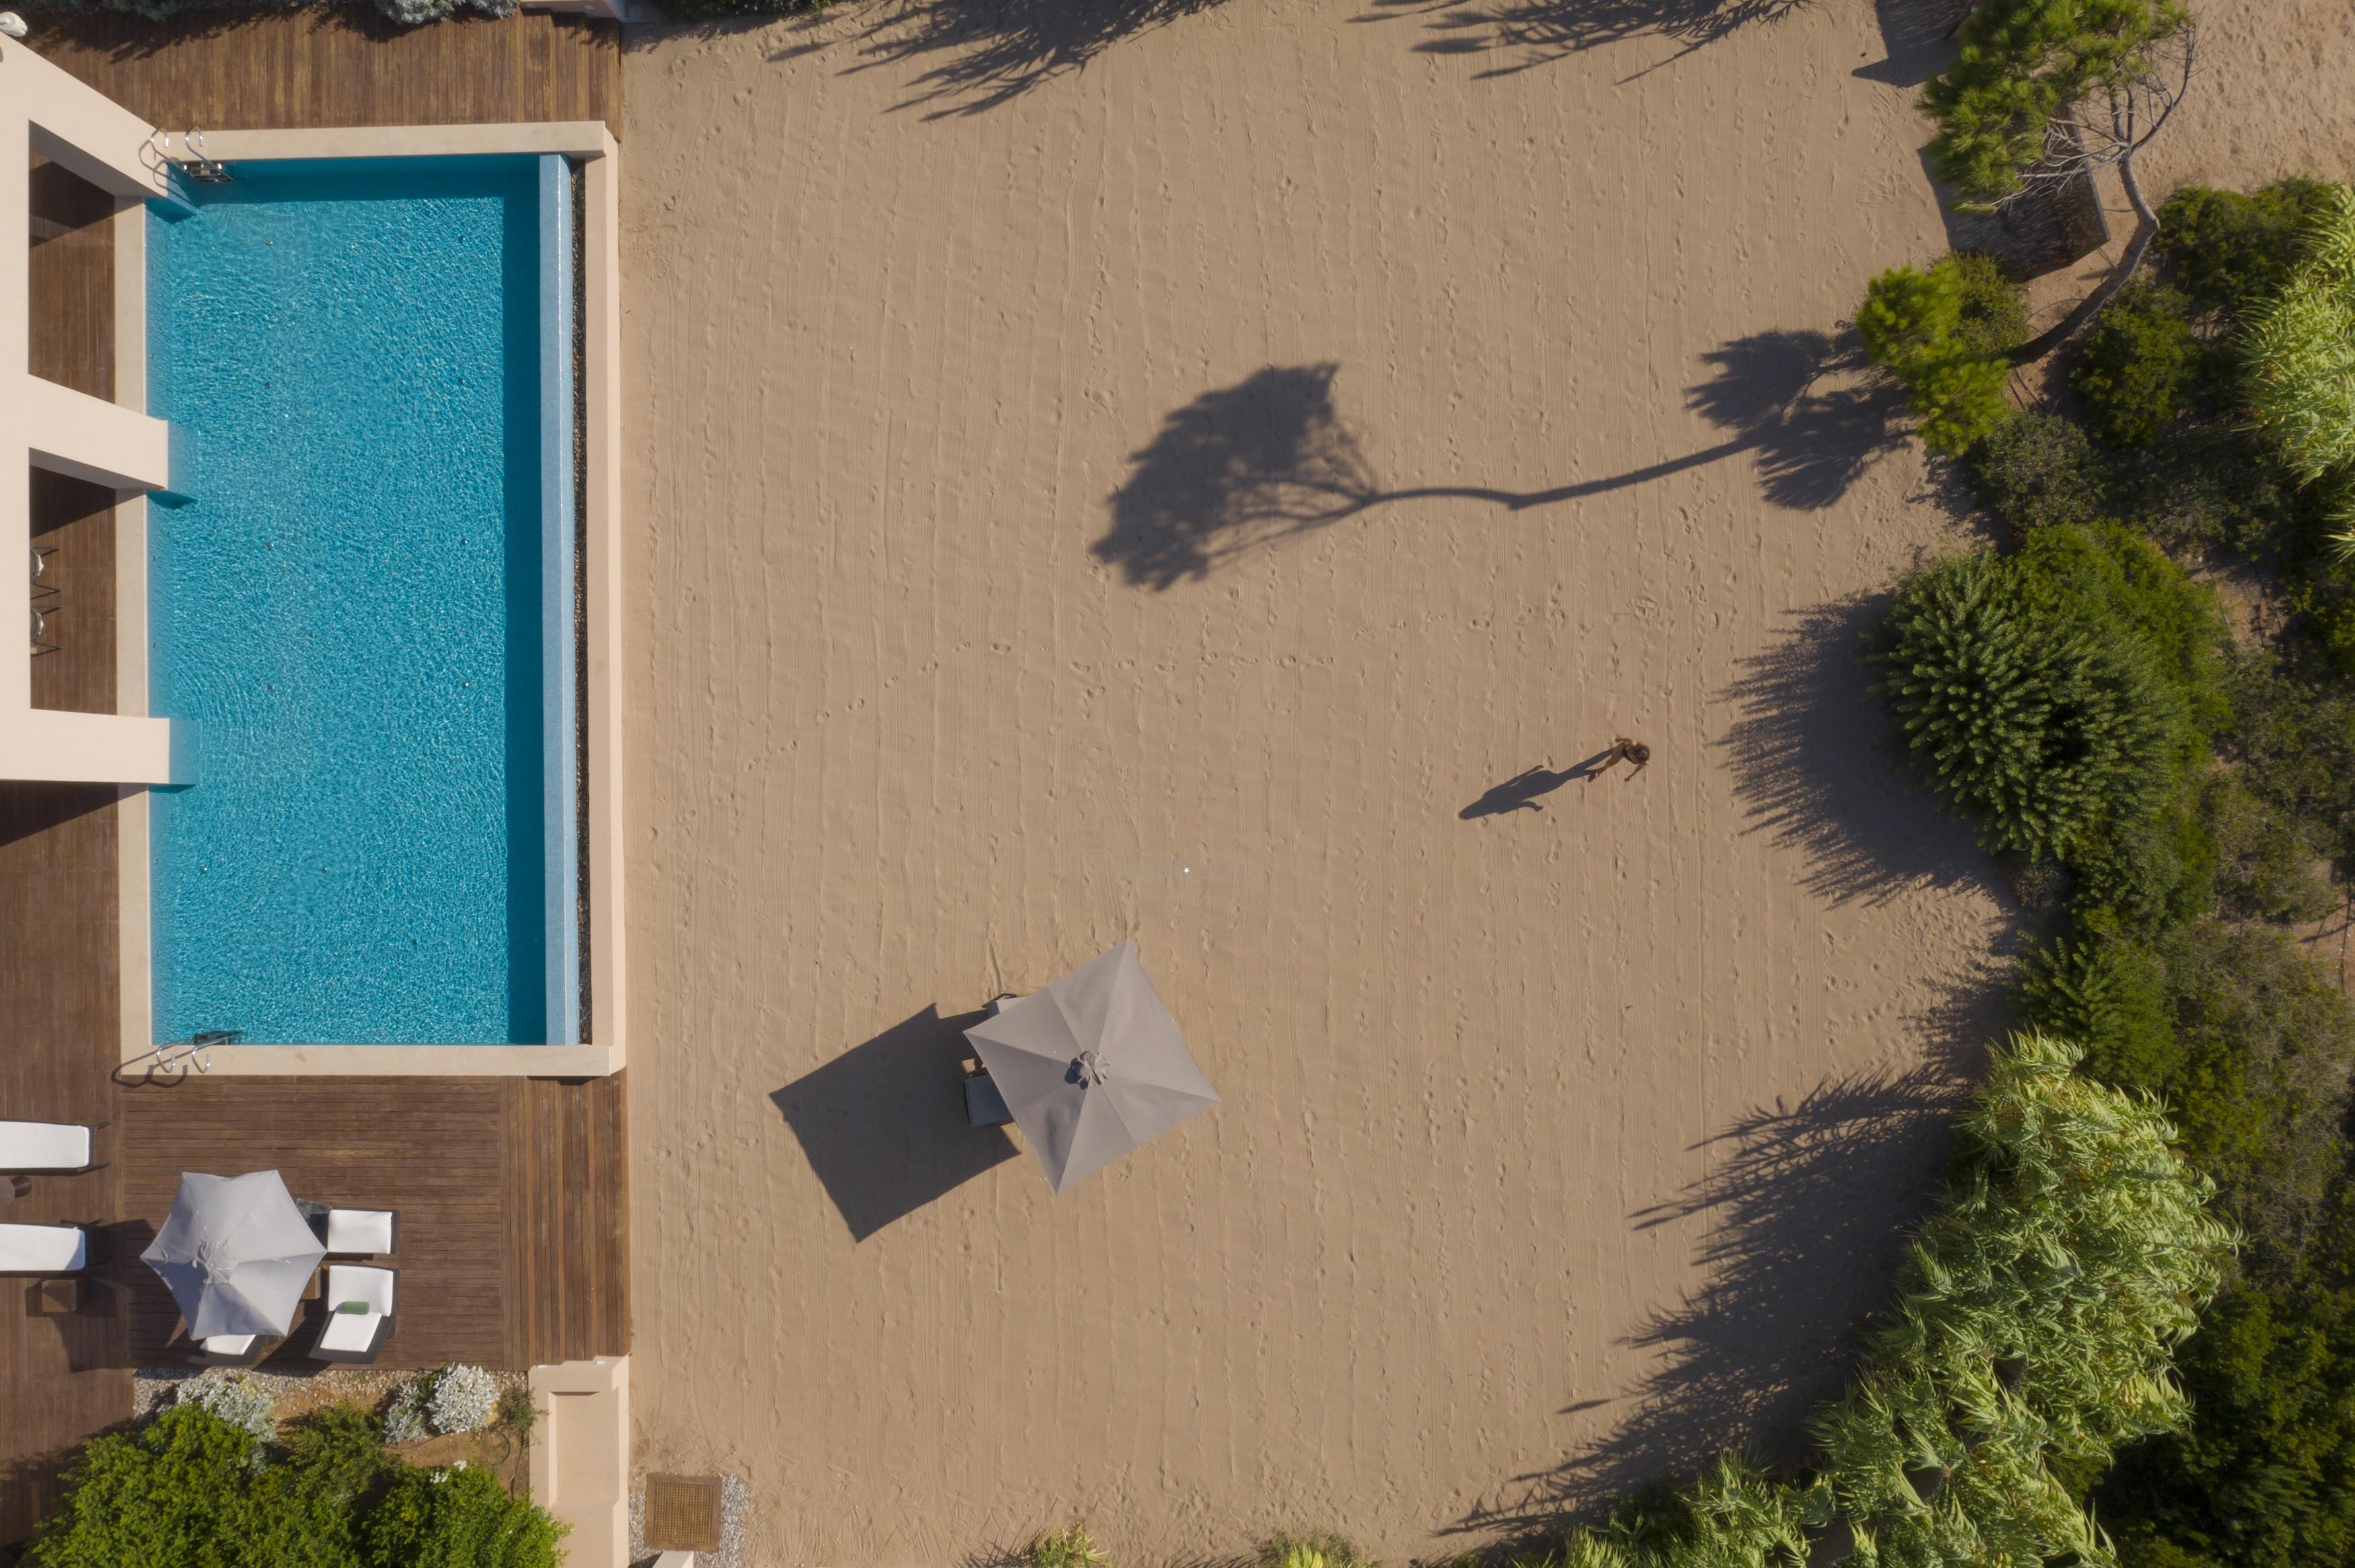 Private pools (1) - Αντιγραφή